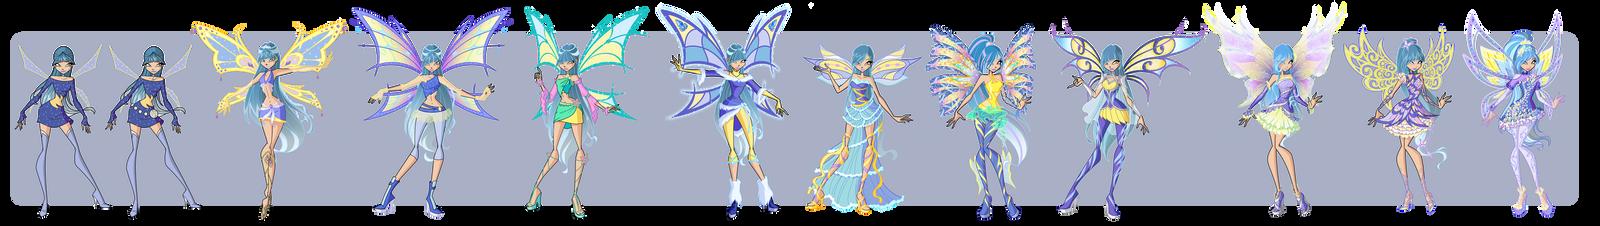 Gloria - transformation evolution by LadyUraniya